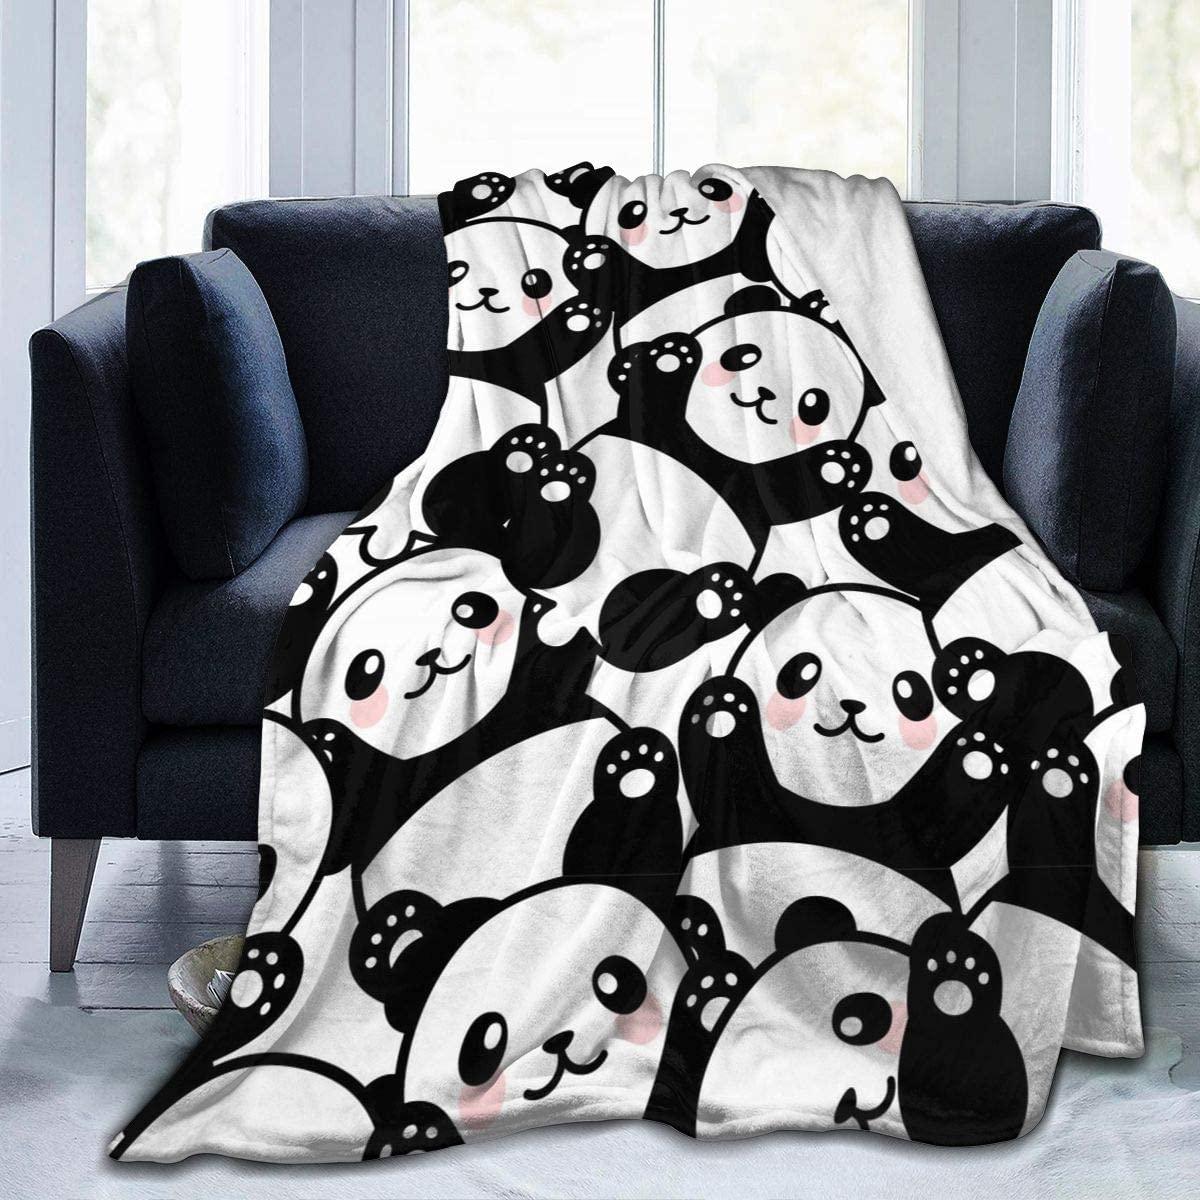 Delerain Panda Soft Throw Blanket 40